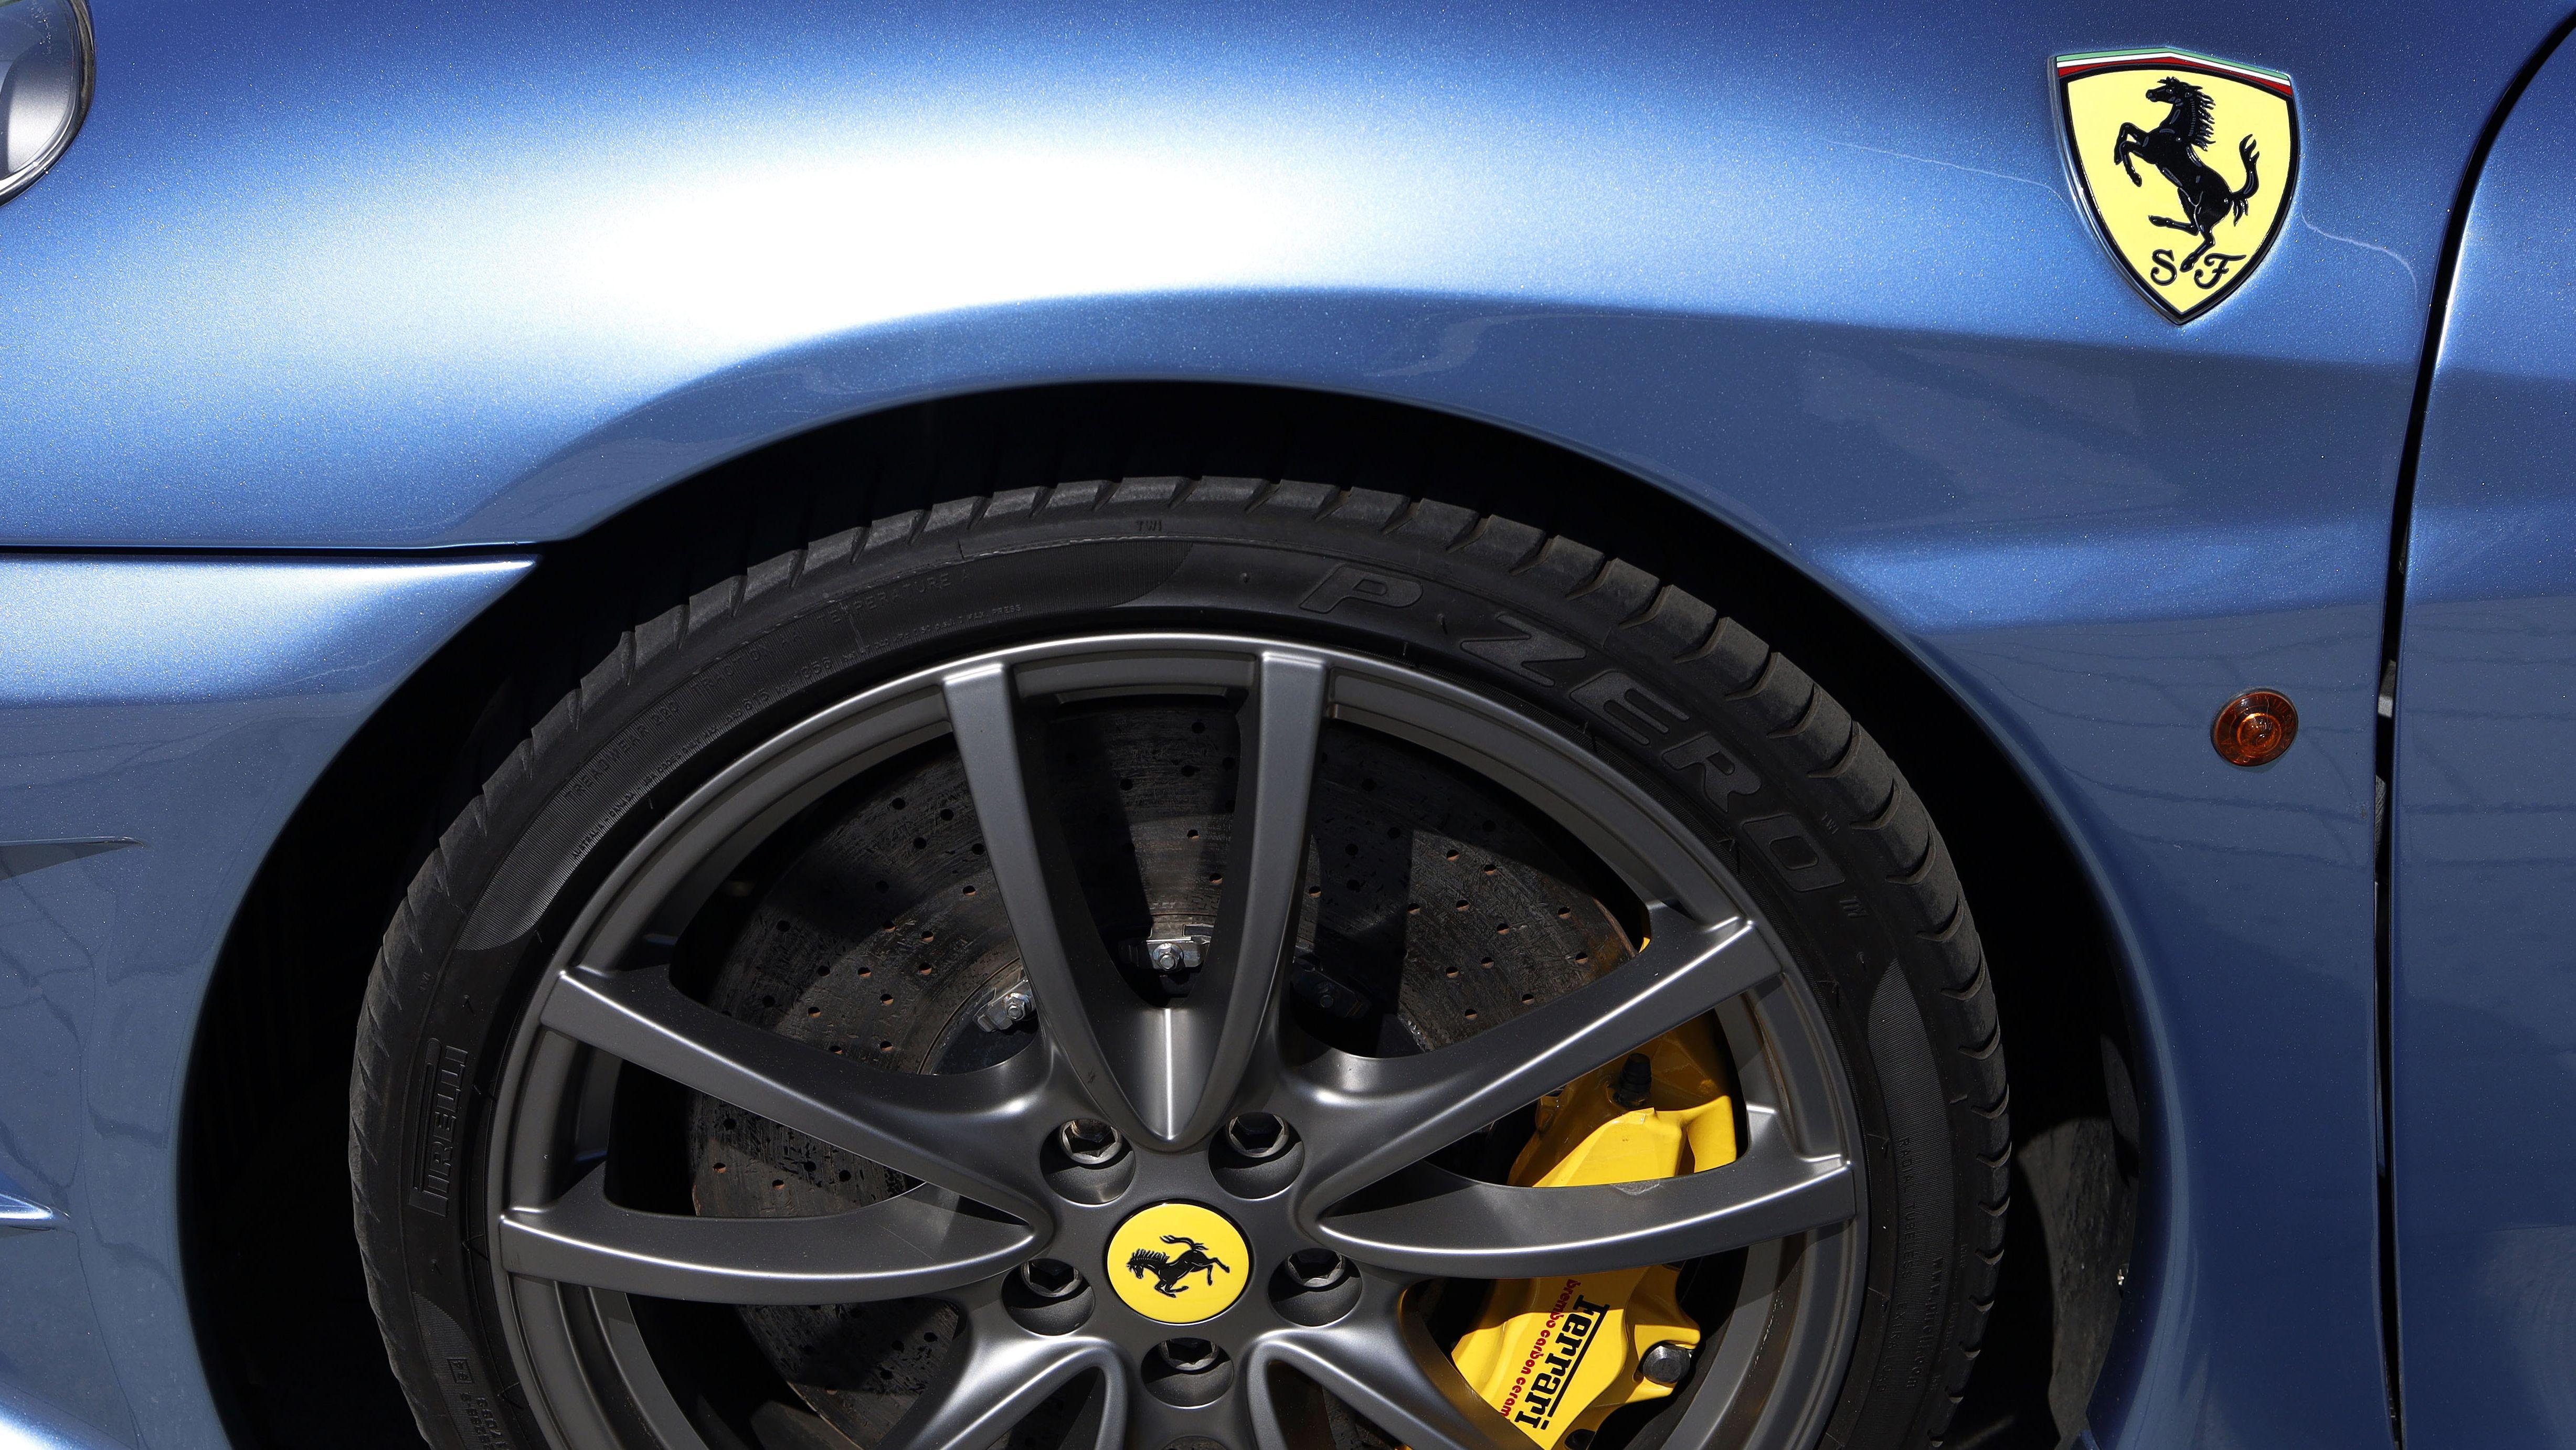 Symbolbild: Felge eines Ferrari